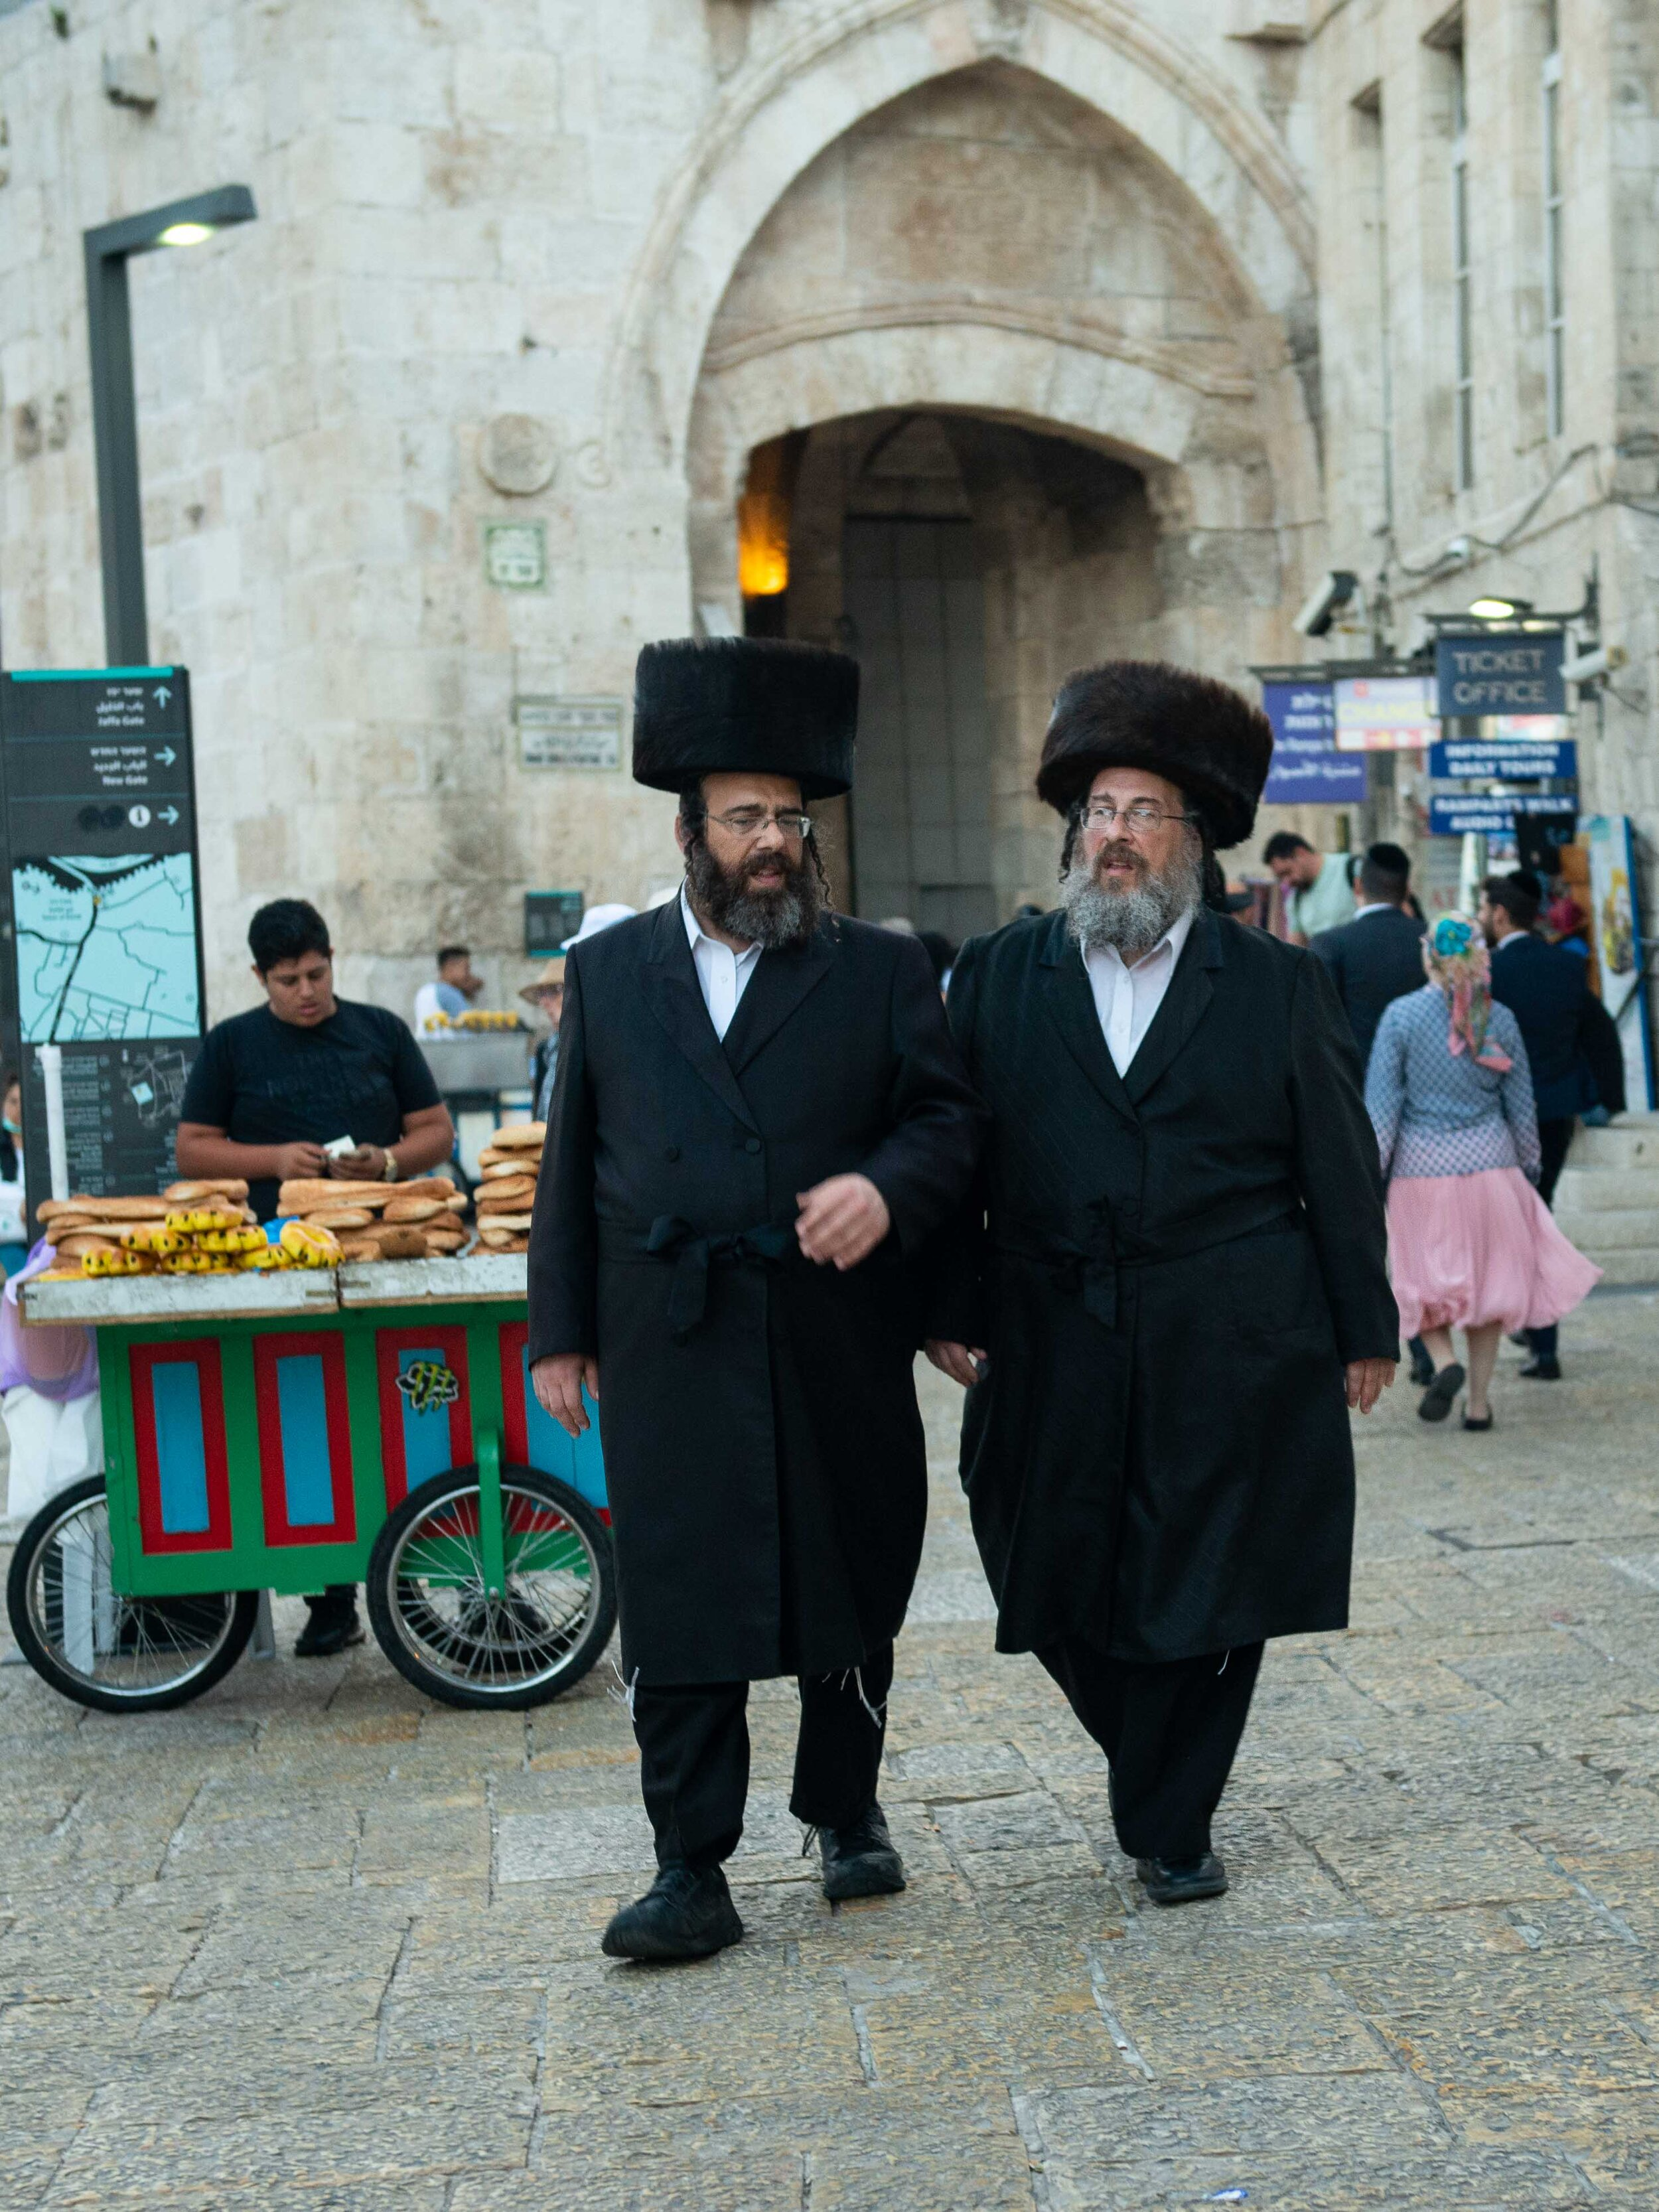 Haredi Jewish men walking through Jaffa Gate into the Old City, Jerusalem